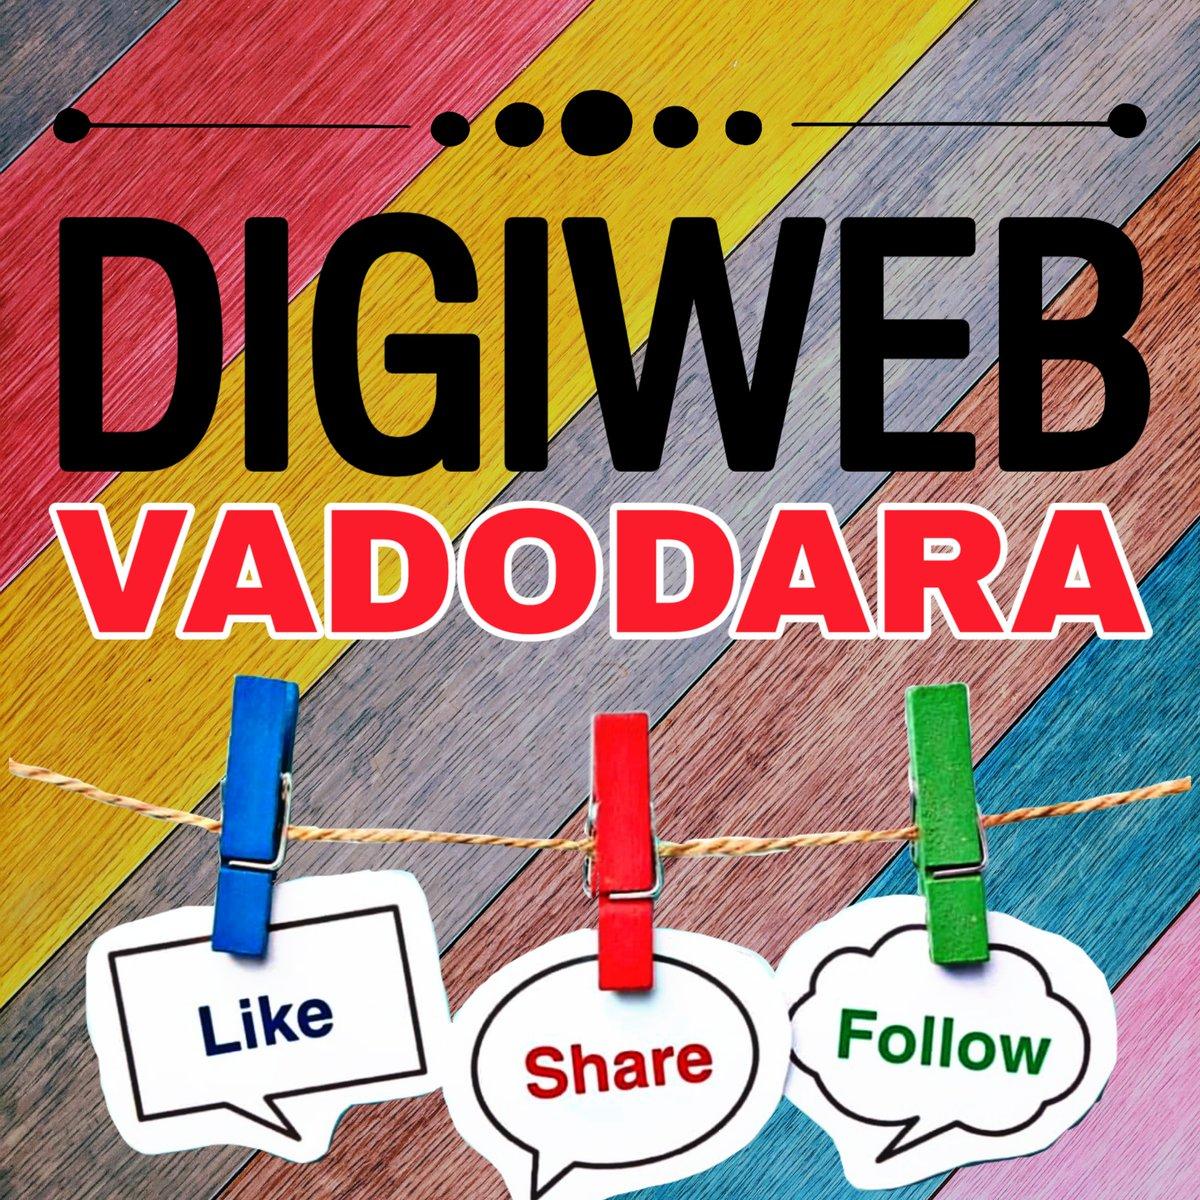 A Perfect Solution For Advertising & Marketing In Vadodara @digiwebvadodara #socialmedia  #digitalmarketing #advertising #graphicdesign #vadodara #baroda #makeinindia #vocalforlocalpic.twitter.com/ee0b8TsbB4